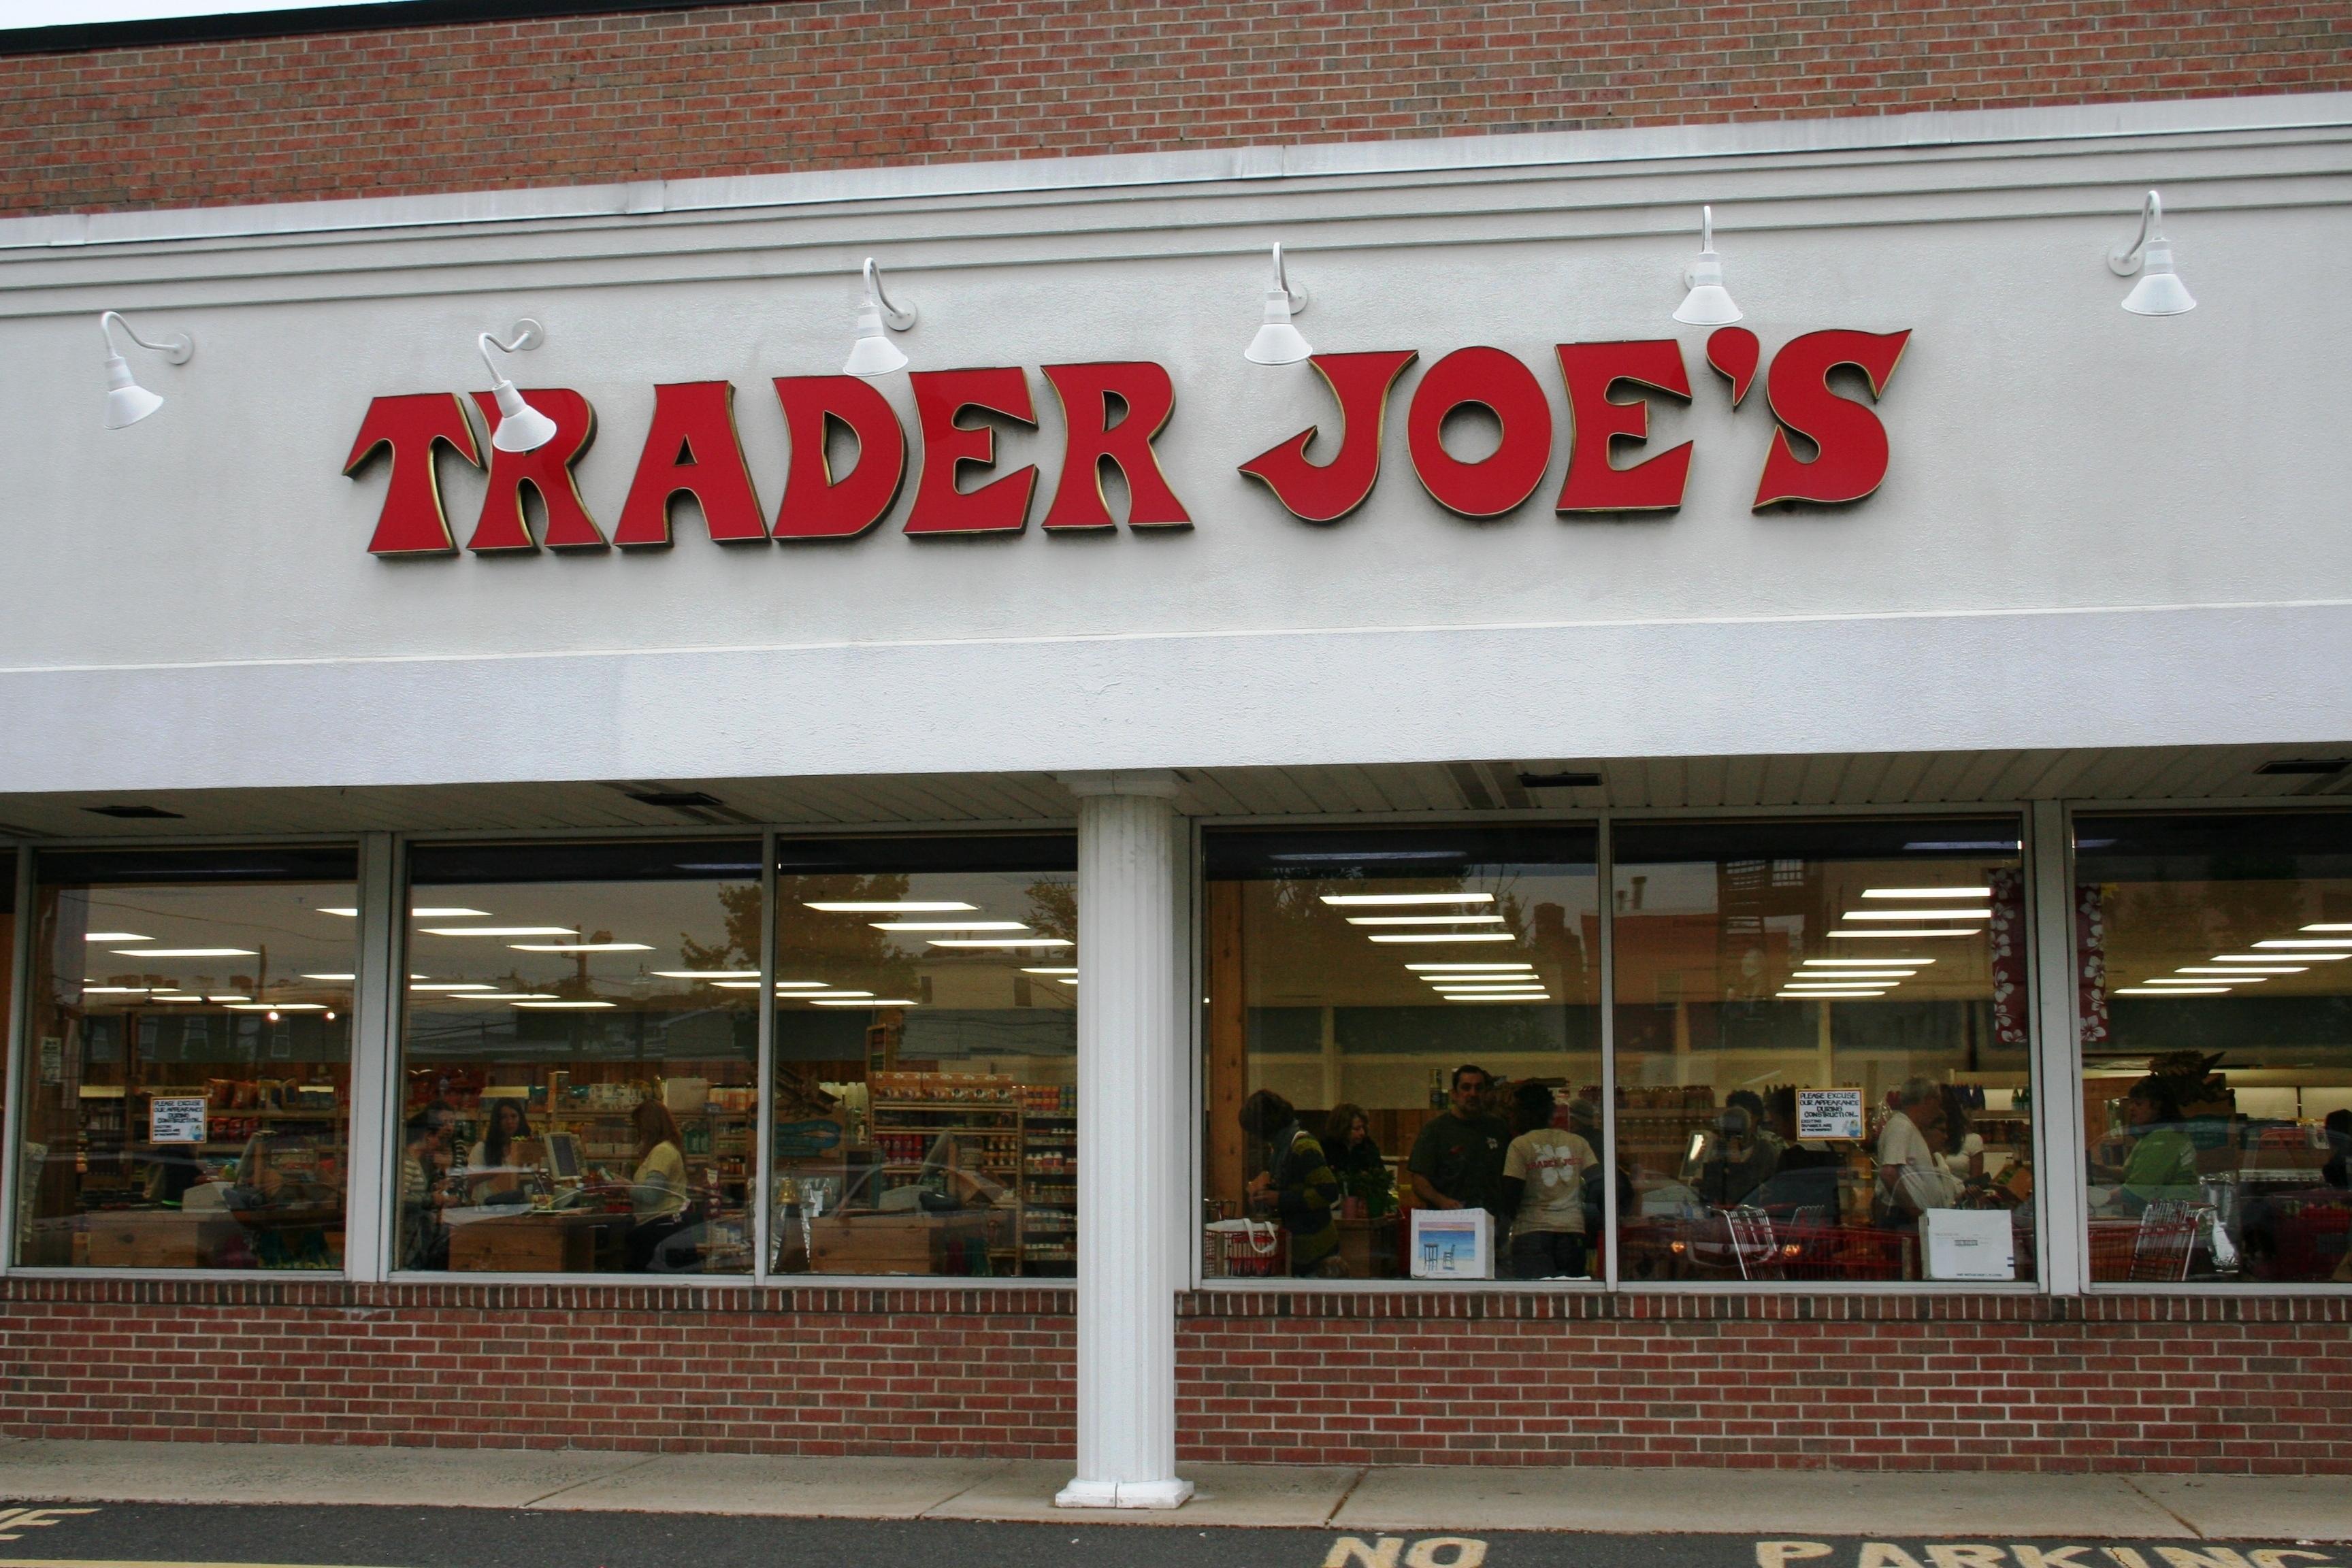 a8fcdd0fd3832b60a279_trader_joe_s.JPG